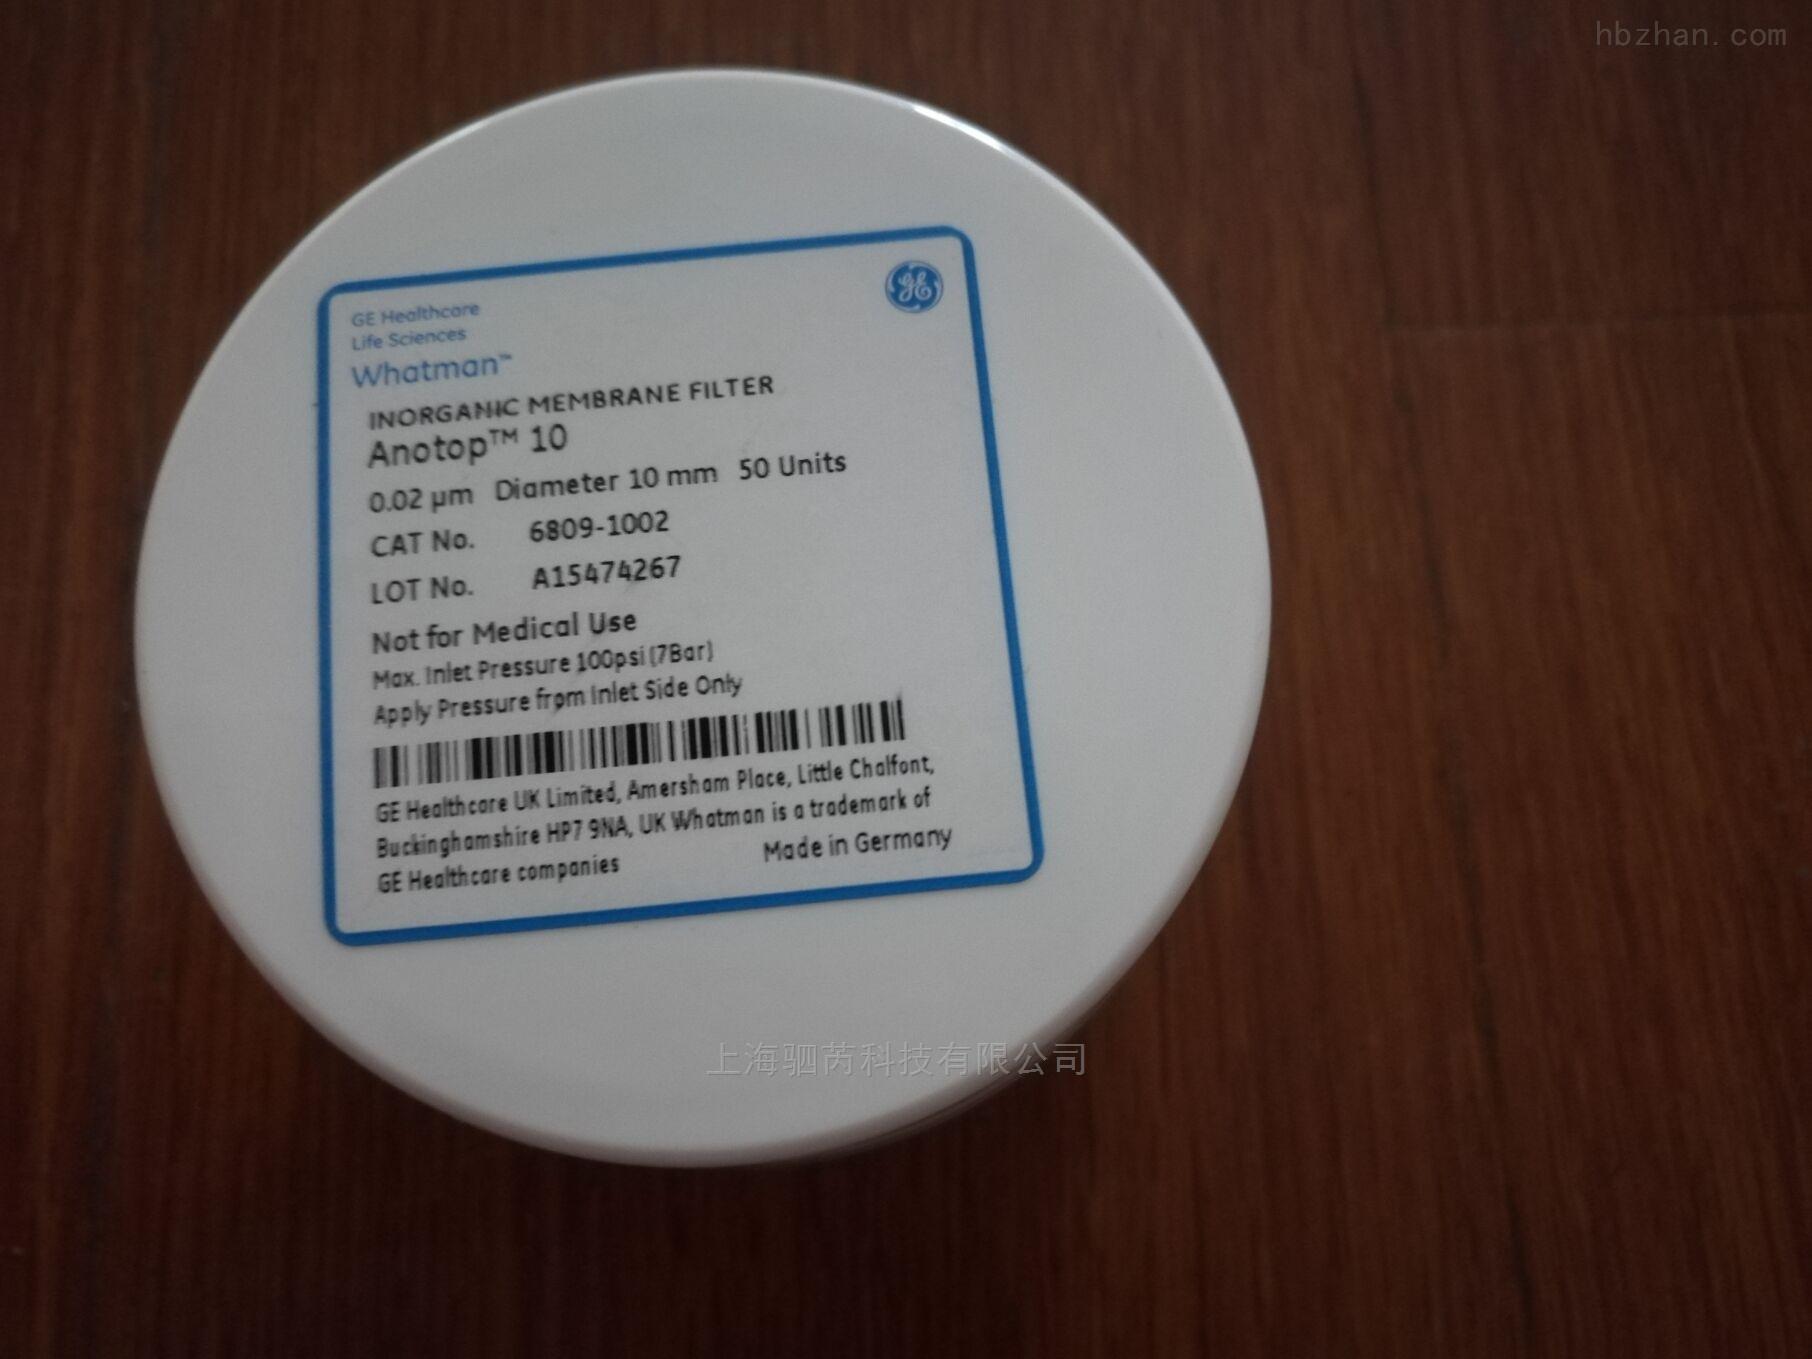 whatman6809-1002氧化铝膜针头滤器